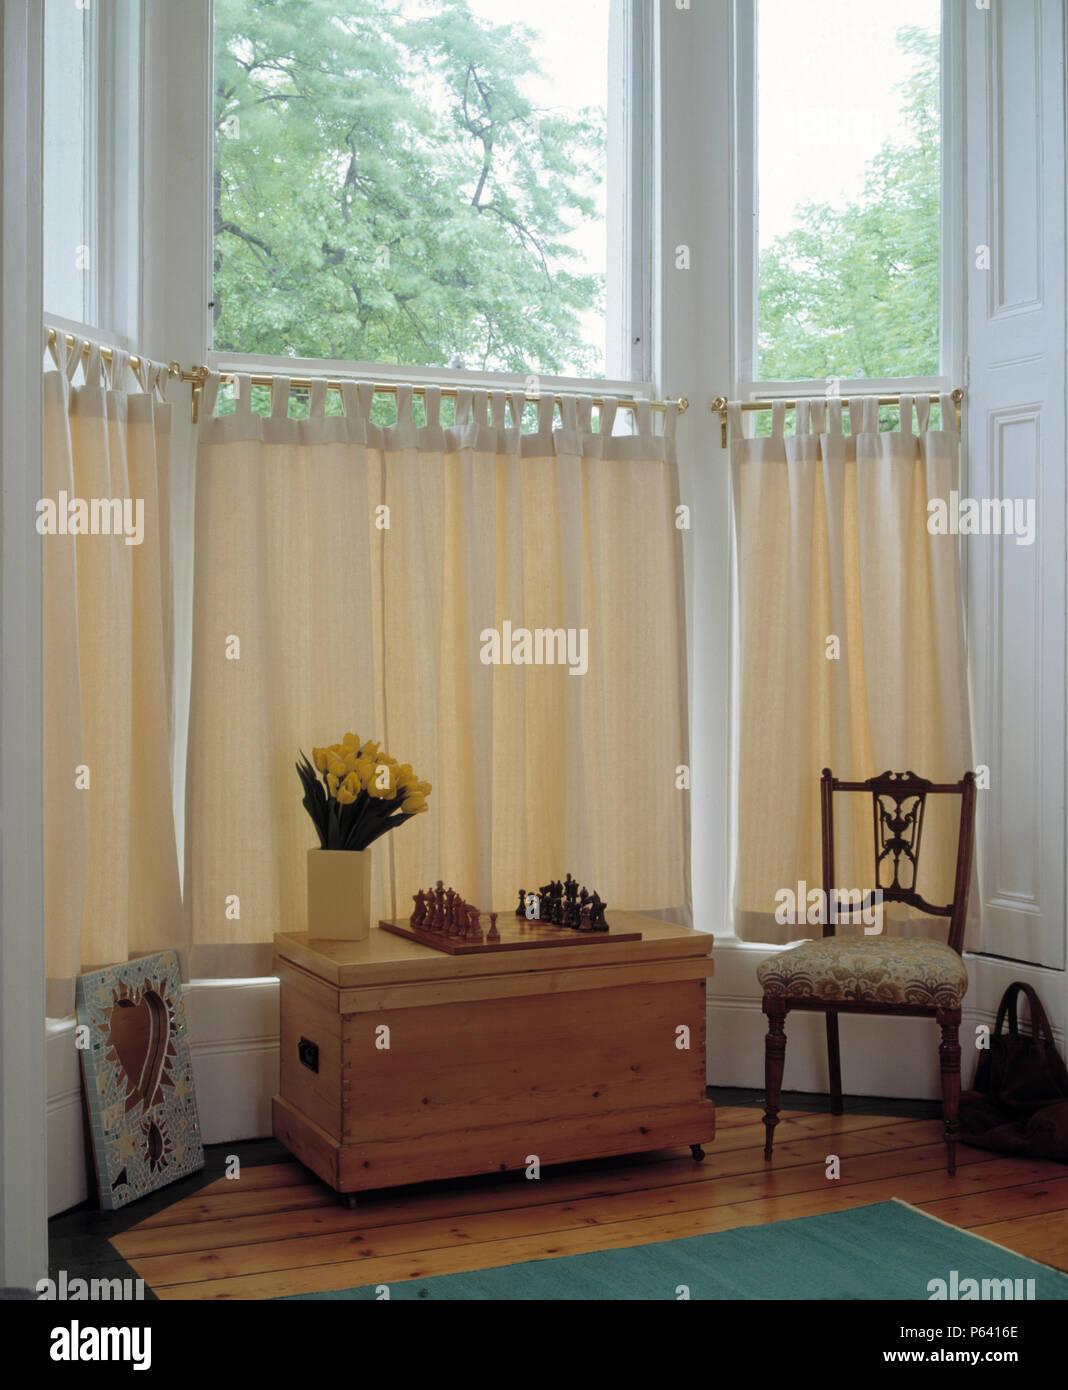 Bay Window Curtains Stock Photos Amp Bay Window Curtains